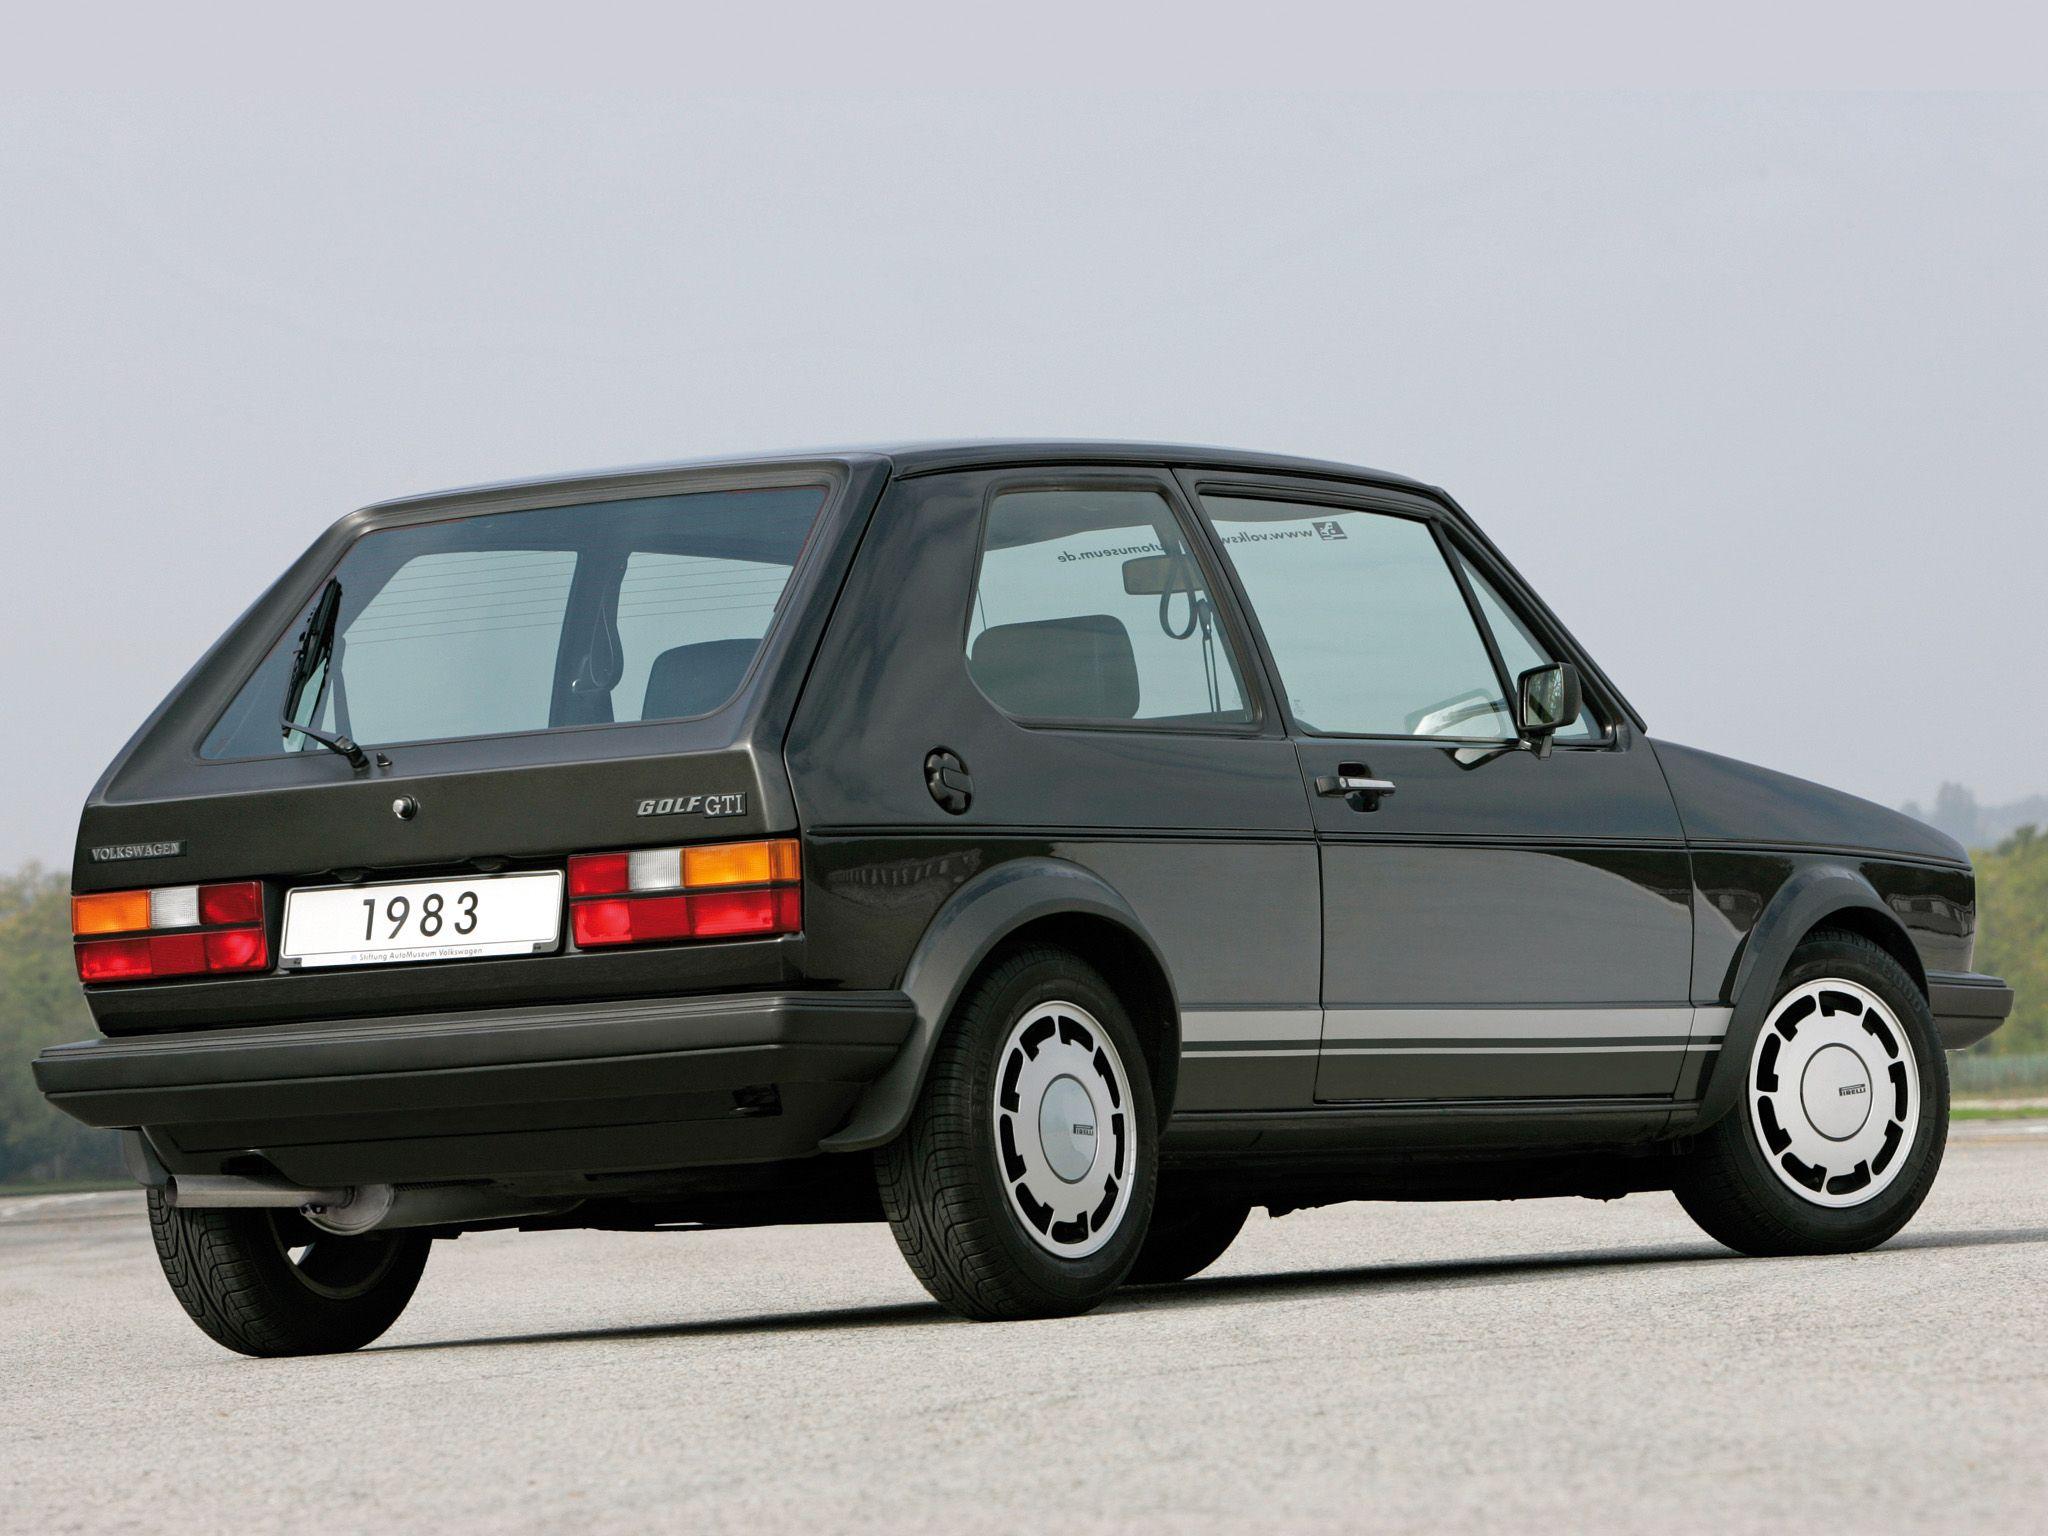 Volkswagen Golf Mk1 Gti Volkswagen Golf Mk2 Volkswagen Golf Volkswagen Golf Mk1